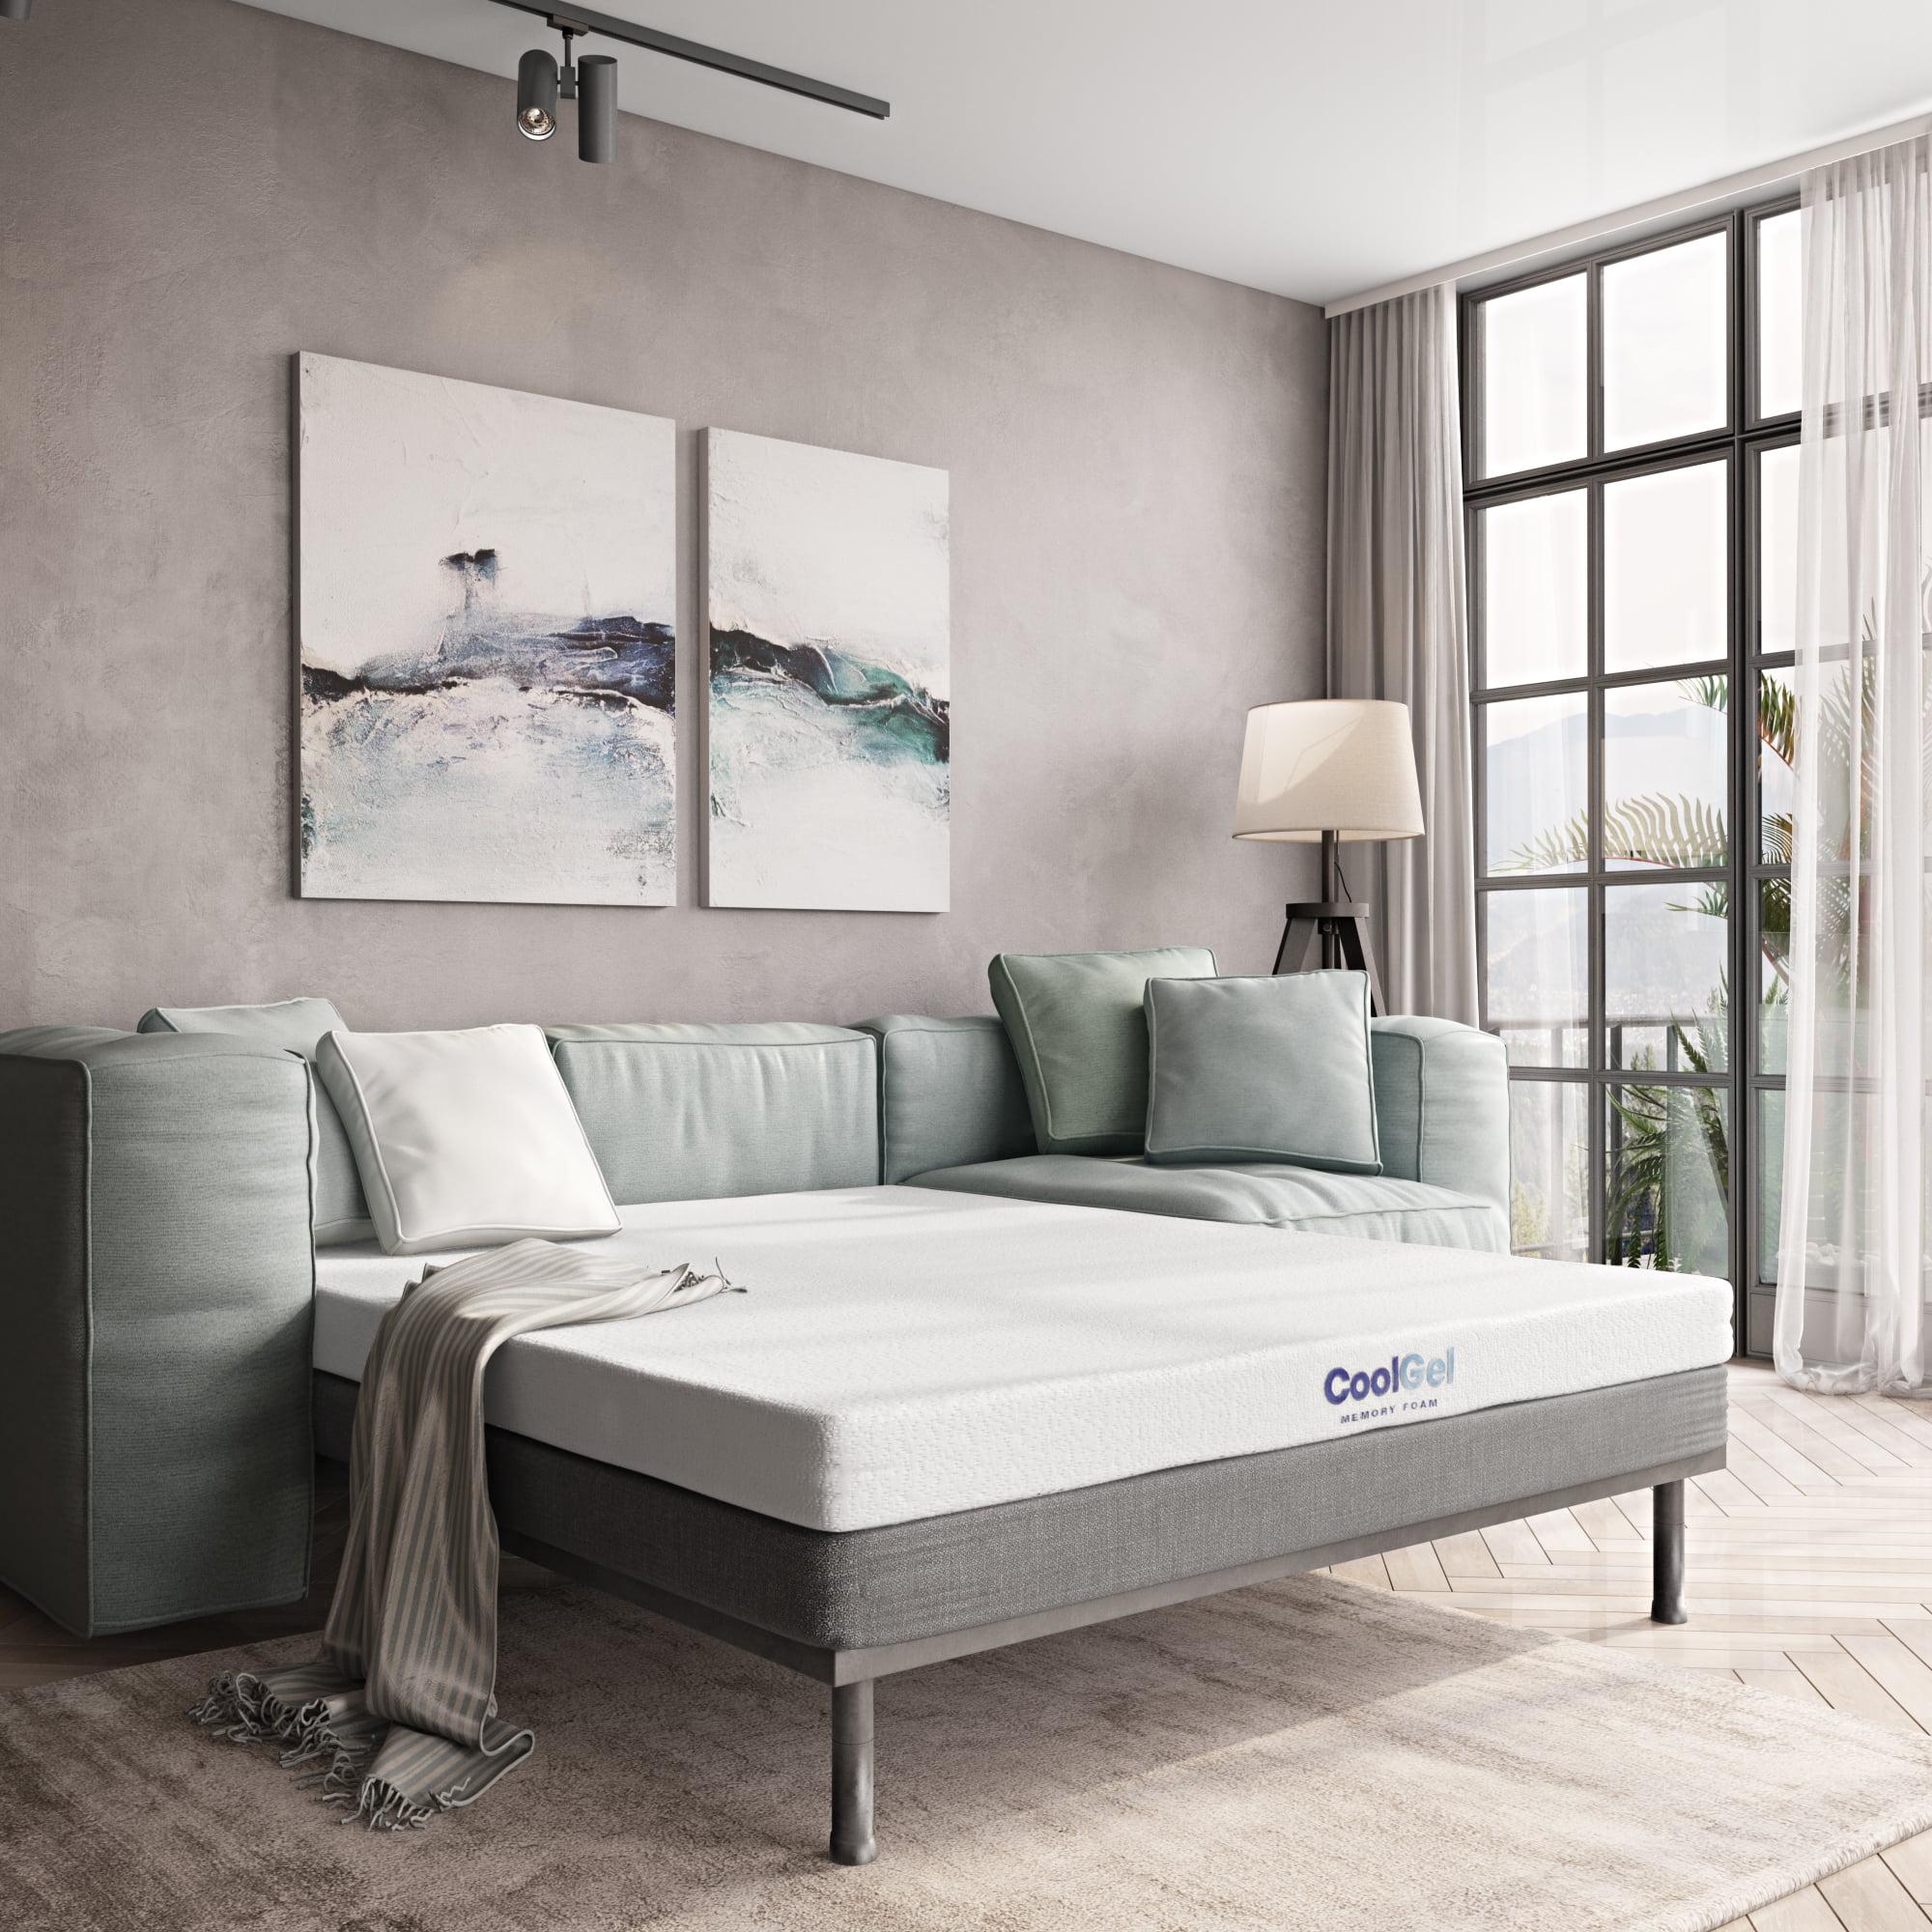 Strange Modern Sleep Cool Gel Memory Foam Replacement Sofa Bed 4 5 Creativecarmelina Interior Chair Design Creativecarmelinacom